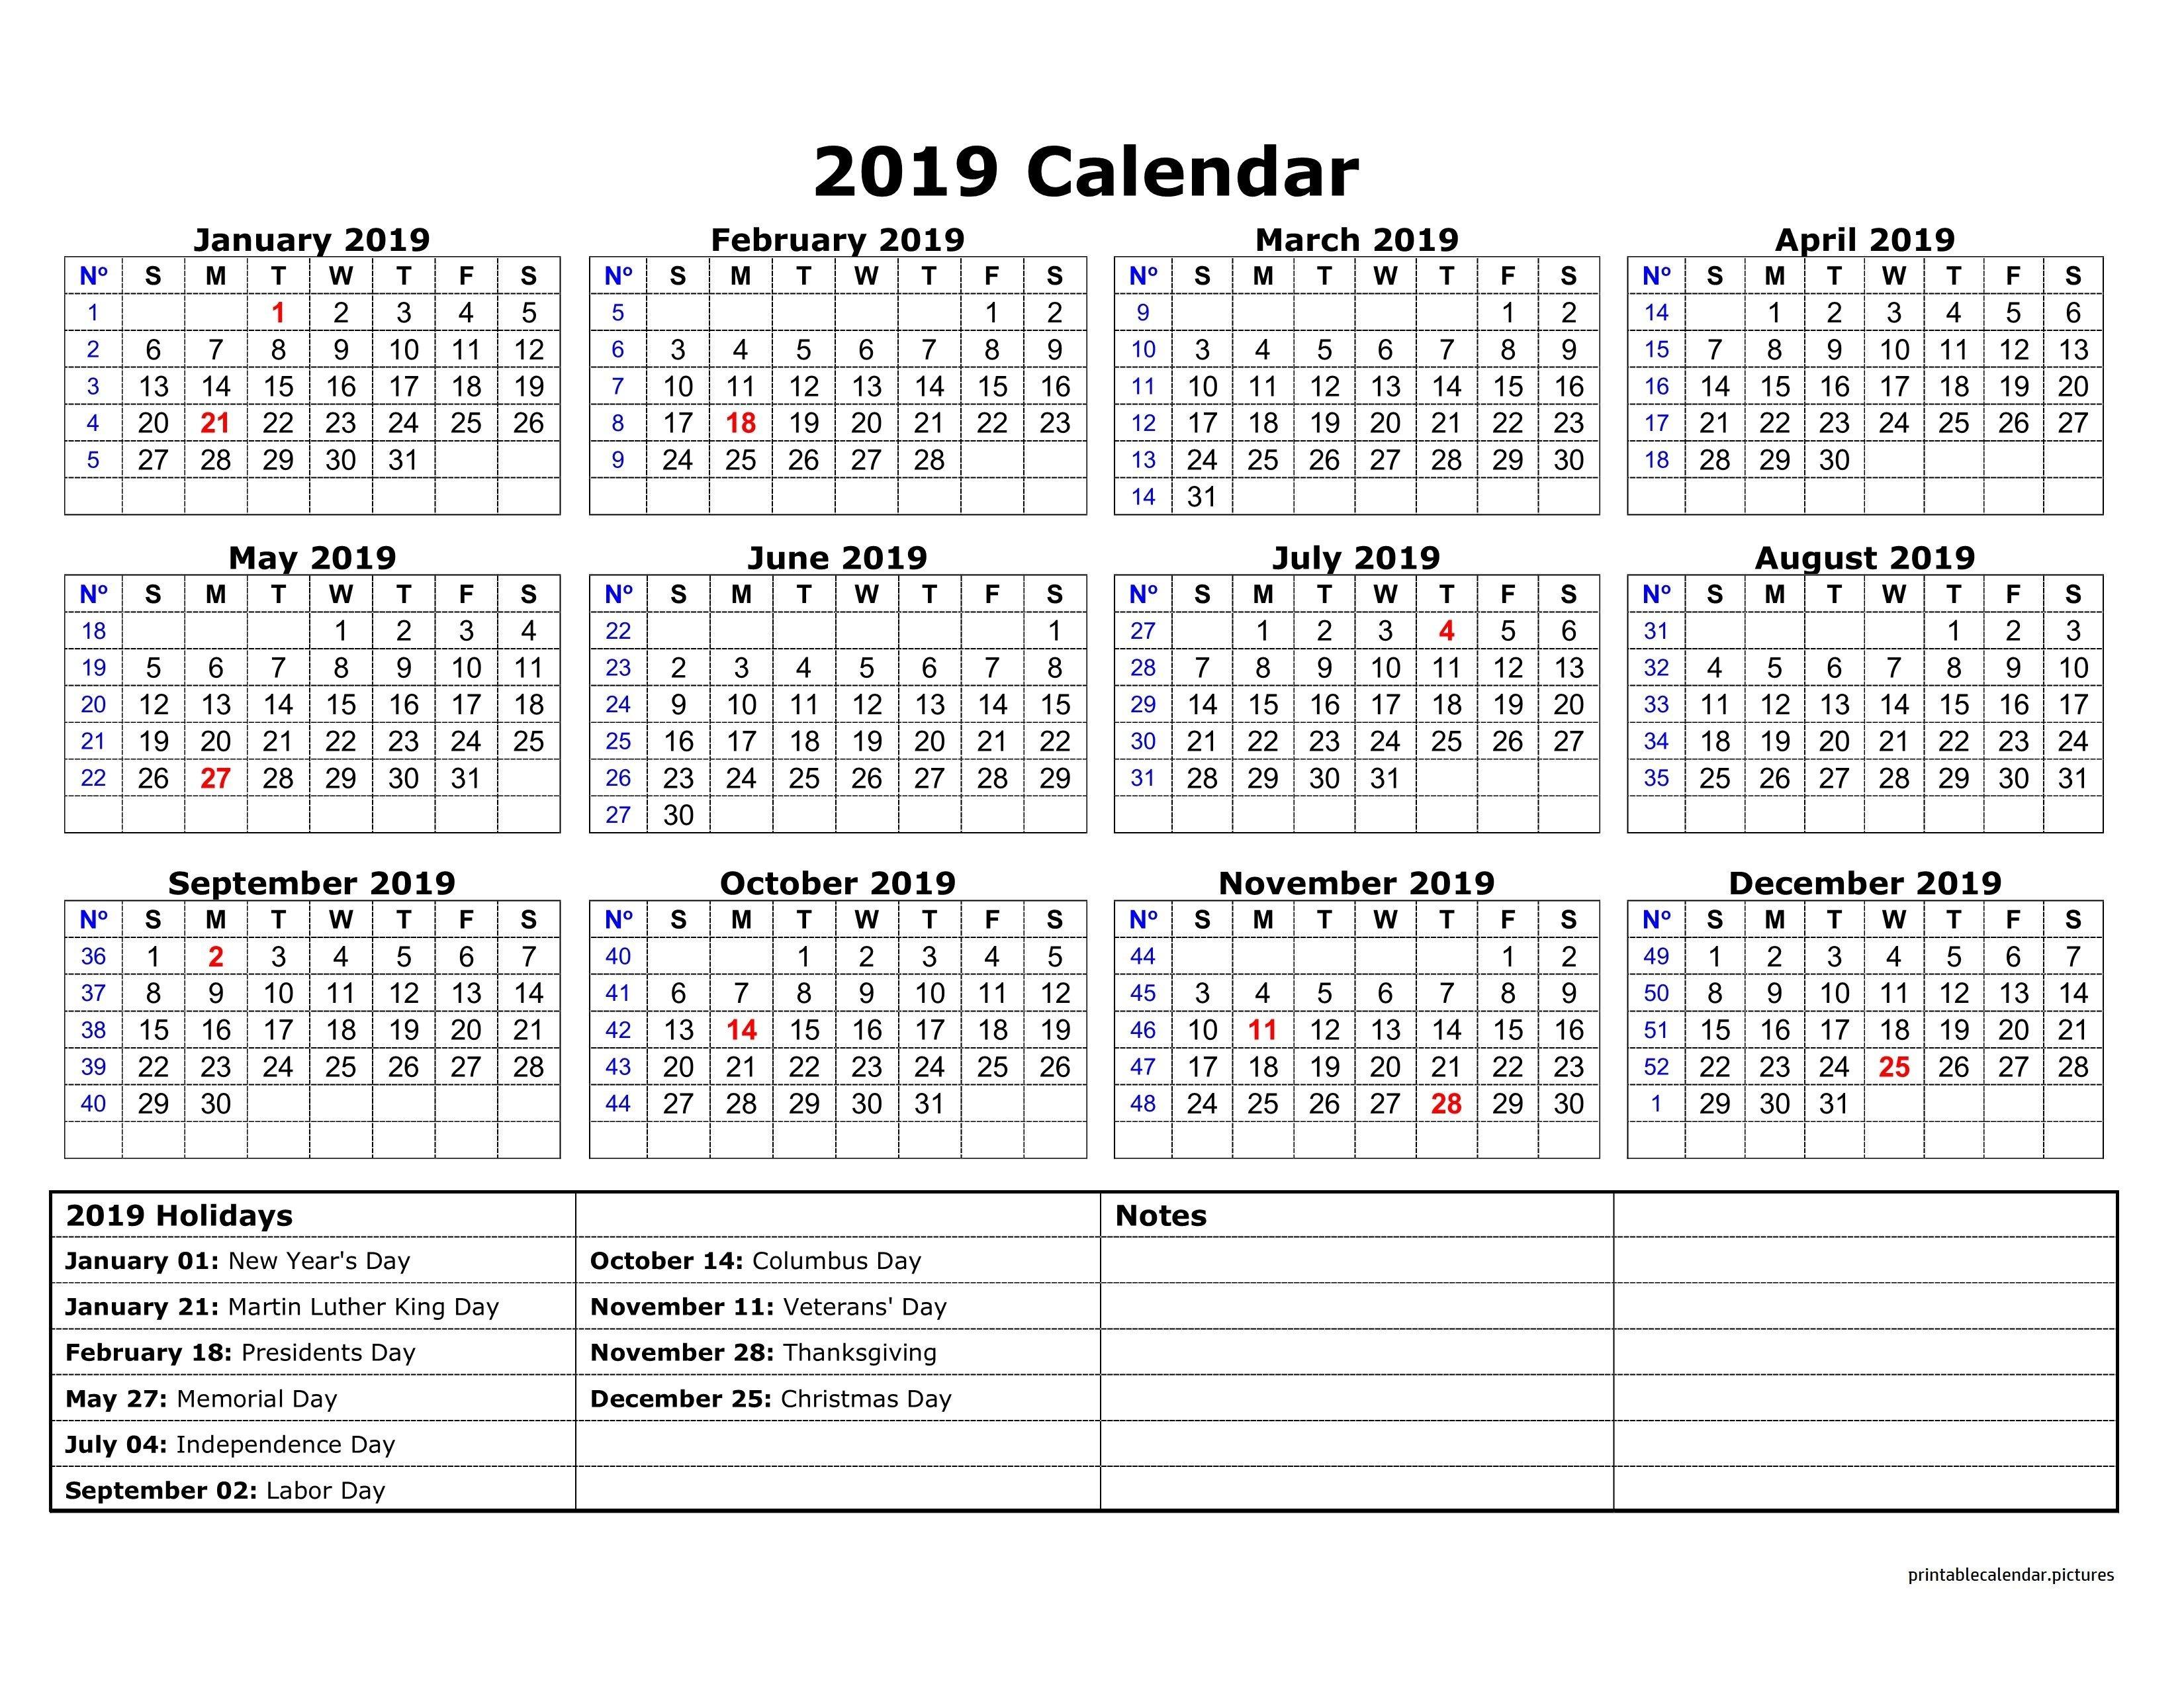 Forex holiday calendar 2019